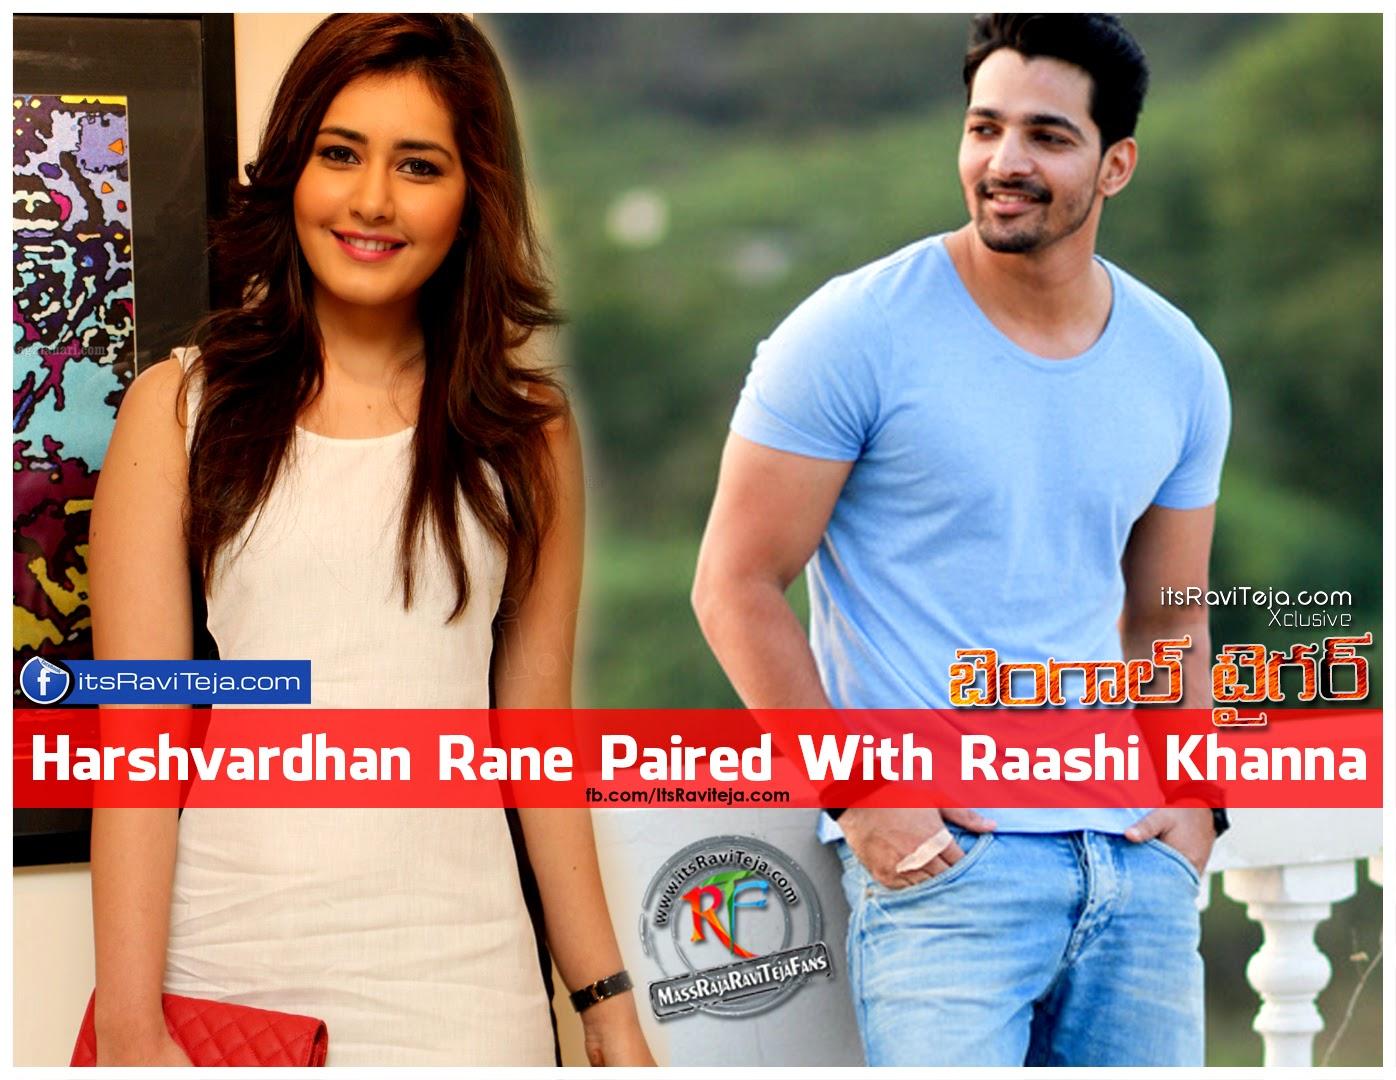 Harshvardhan Rane Paired With Raashi Khanna in Ravi Teja Bengal Tiger